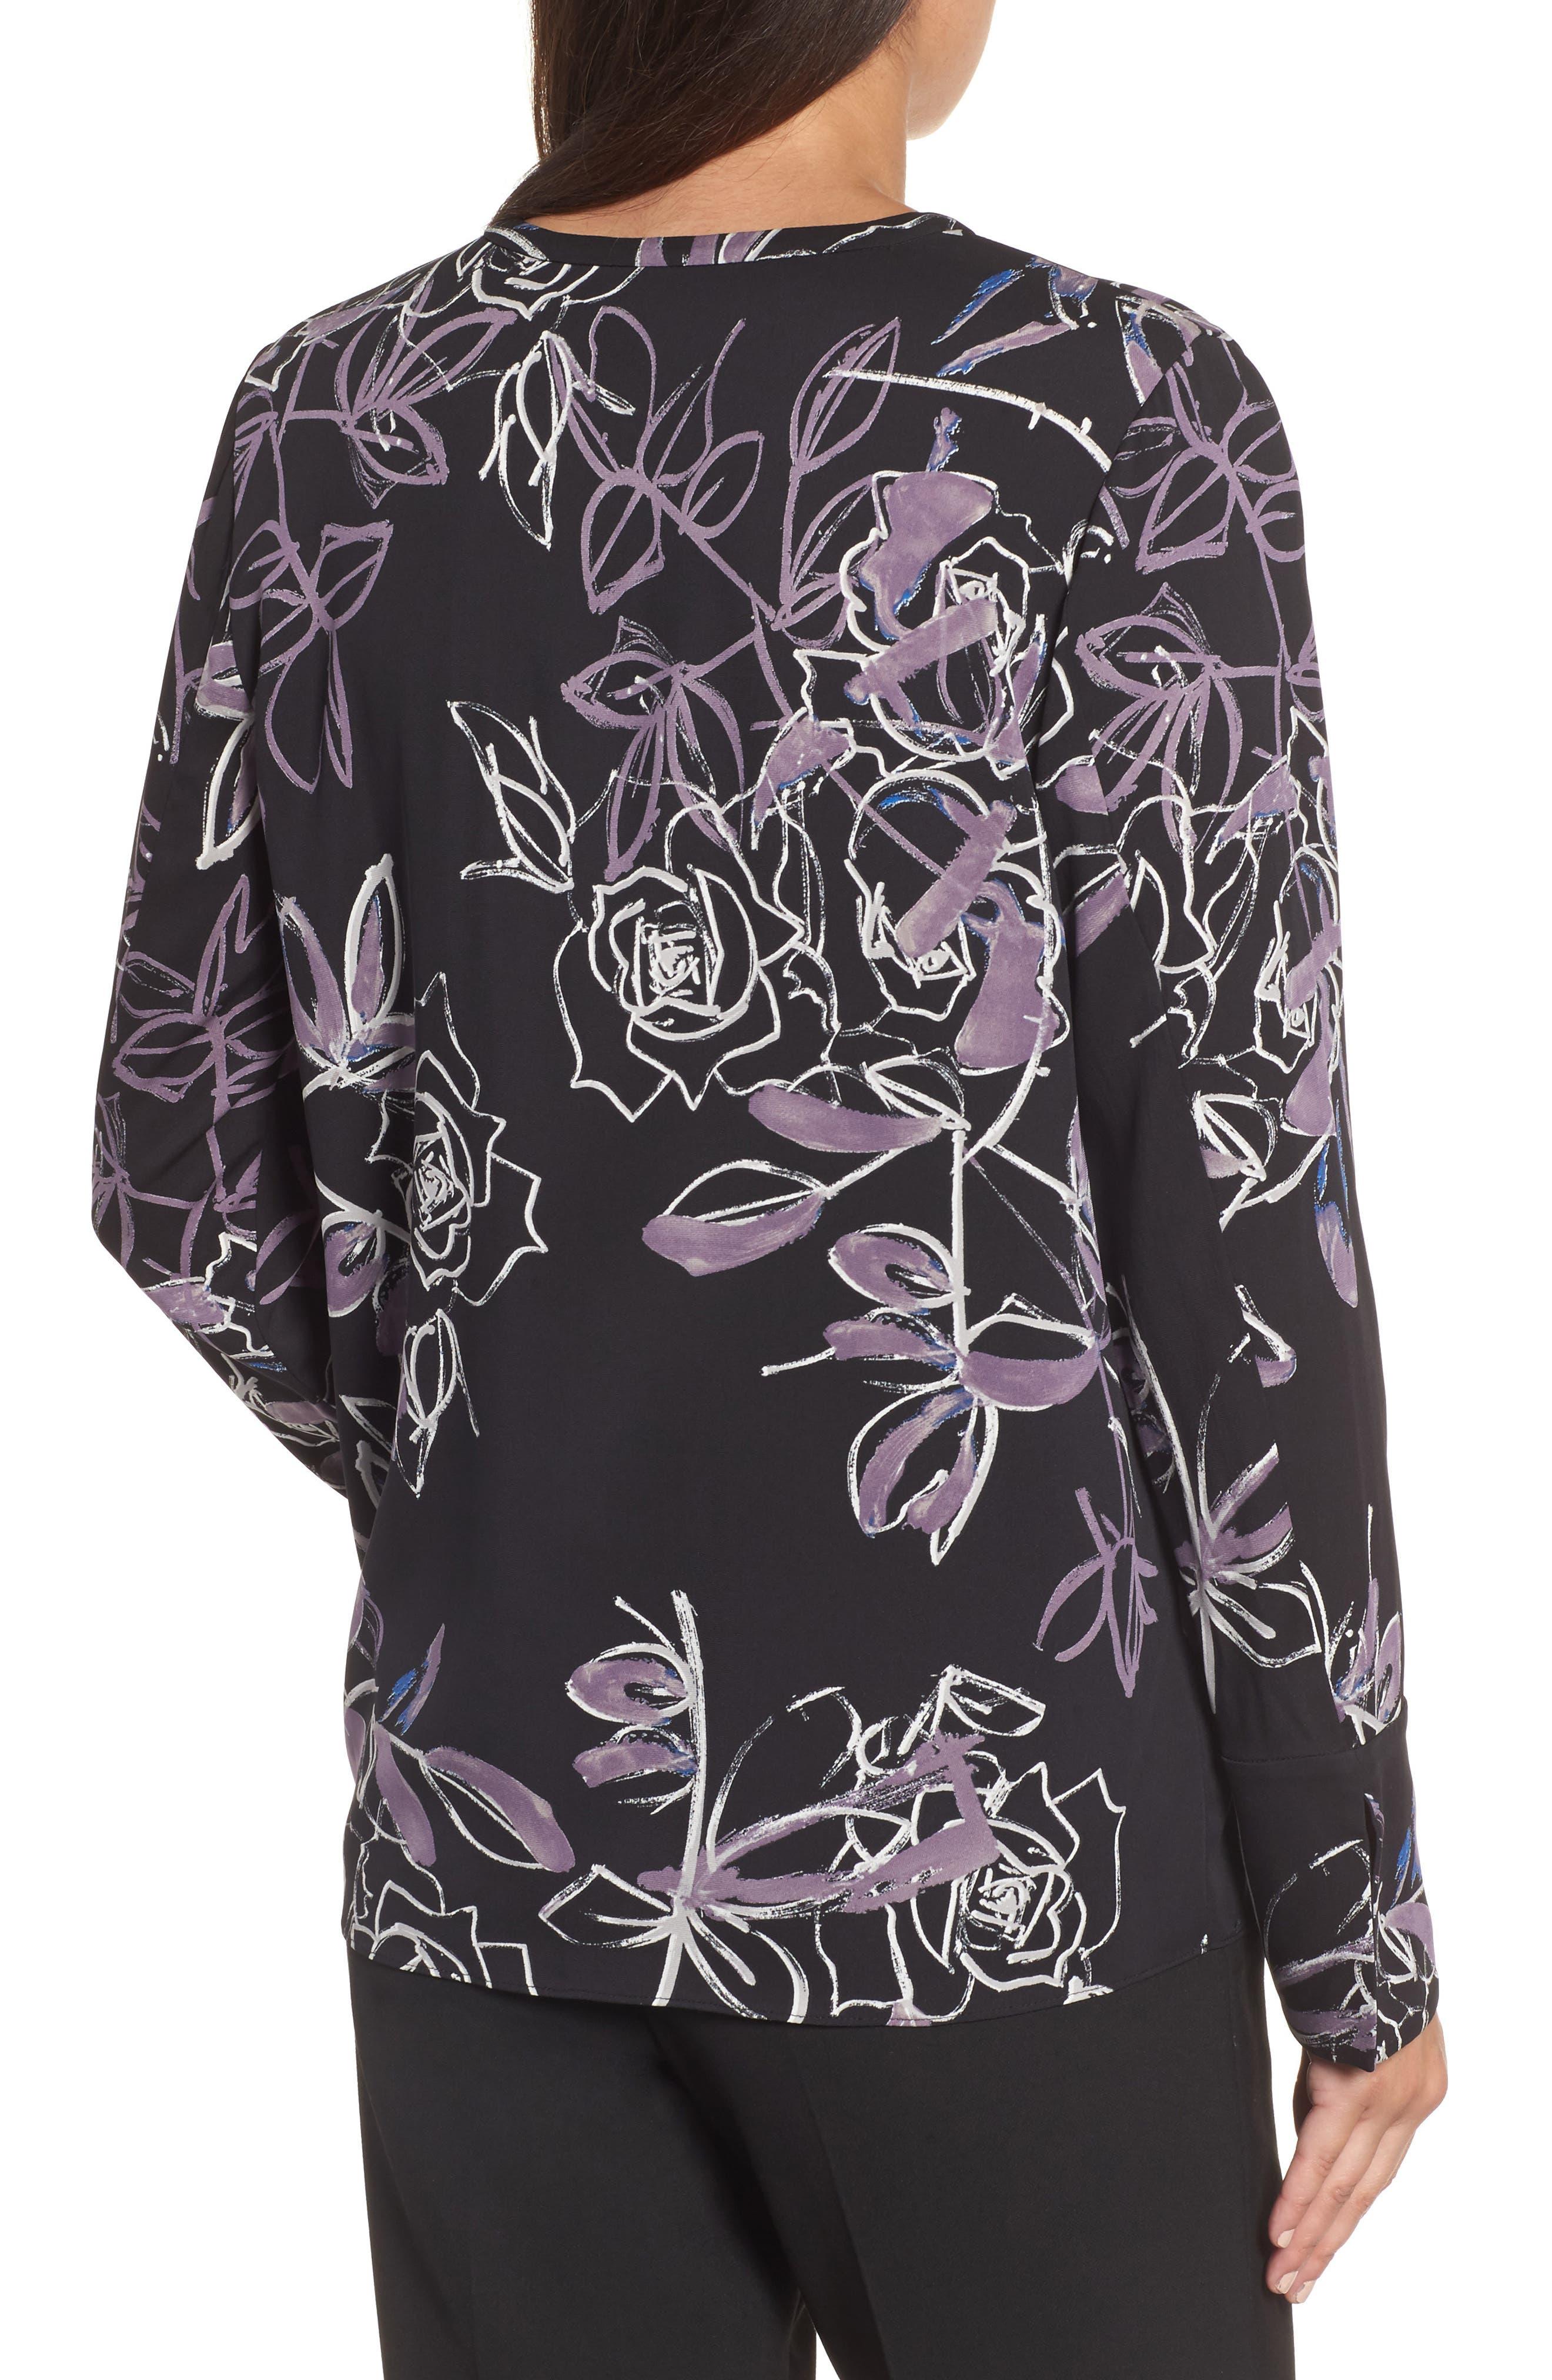 Long Sleeve Print Blouse,                             Alternate thumbnail 2, color,                             Black Roses Print